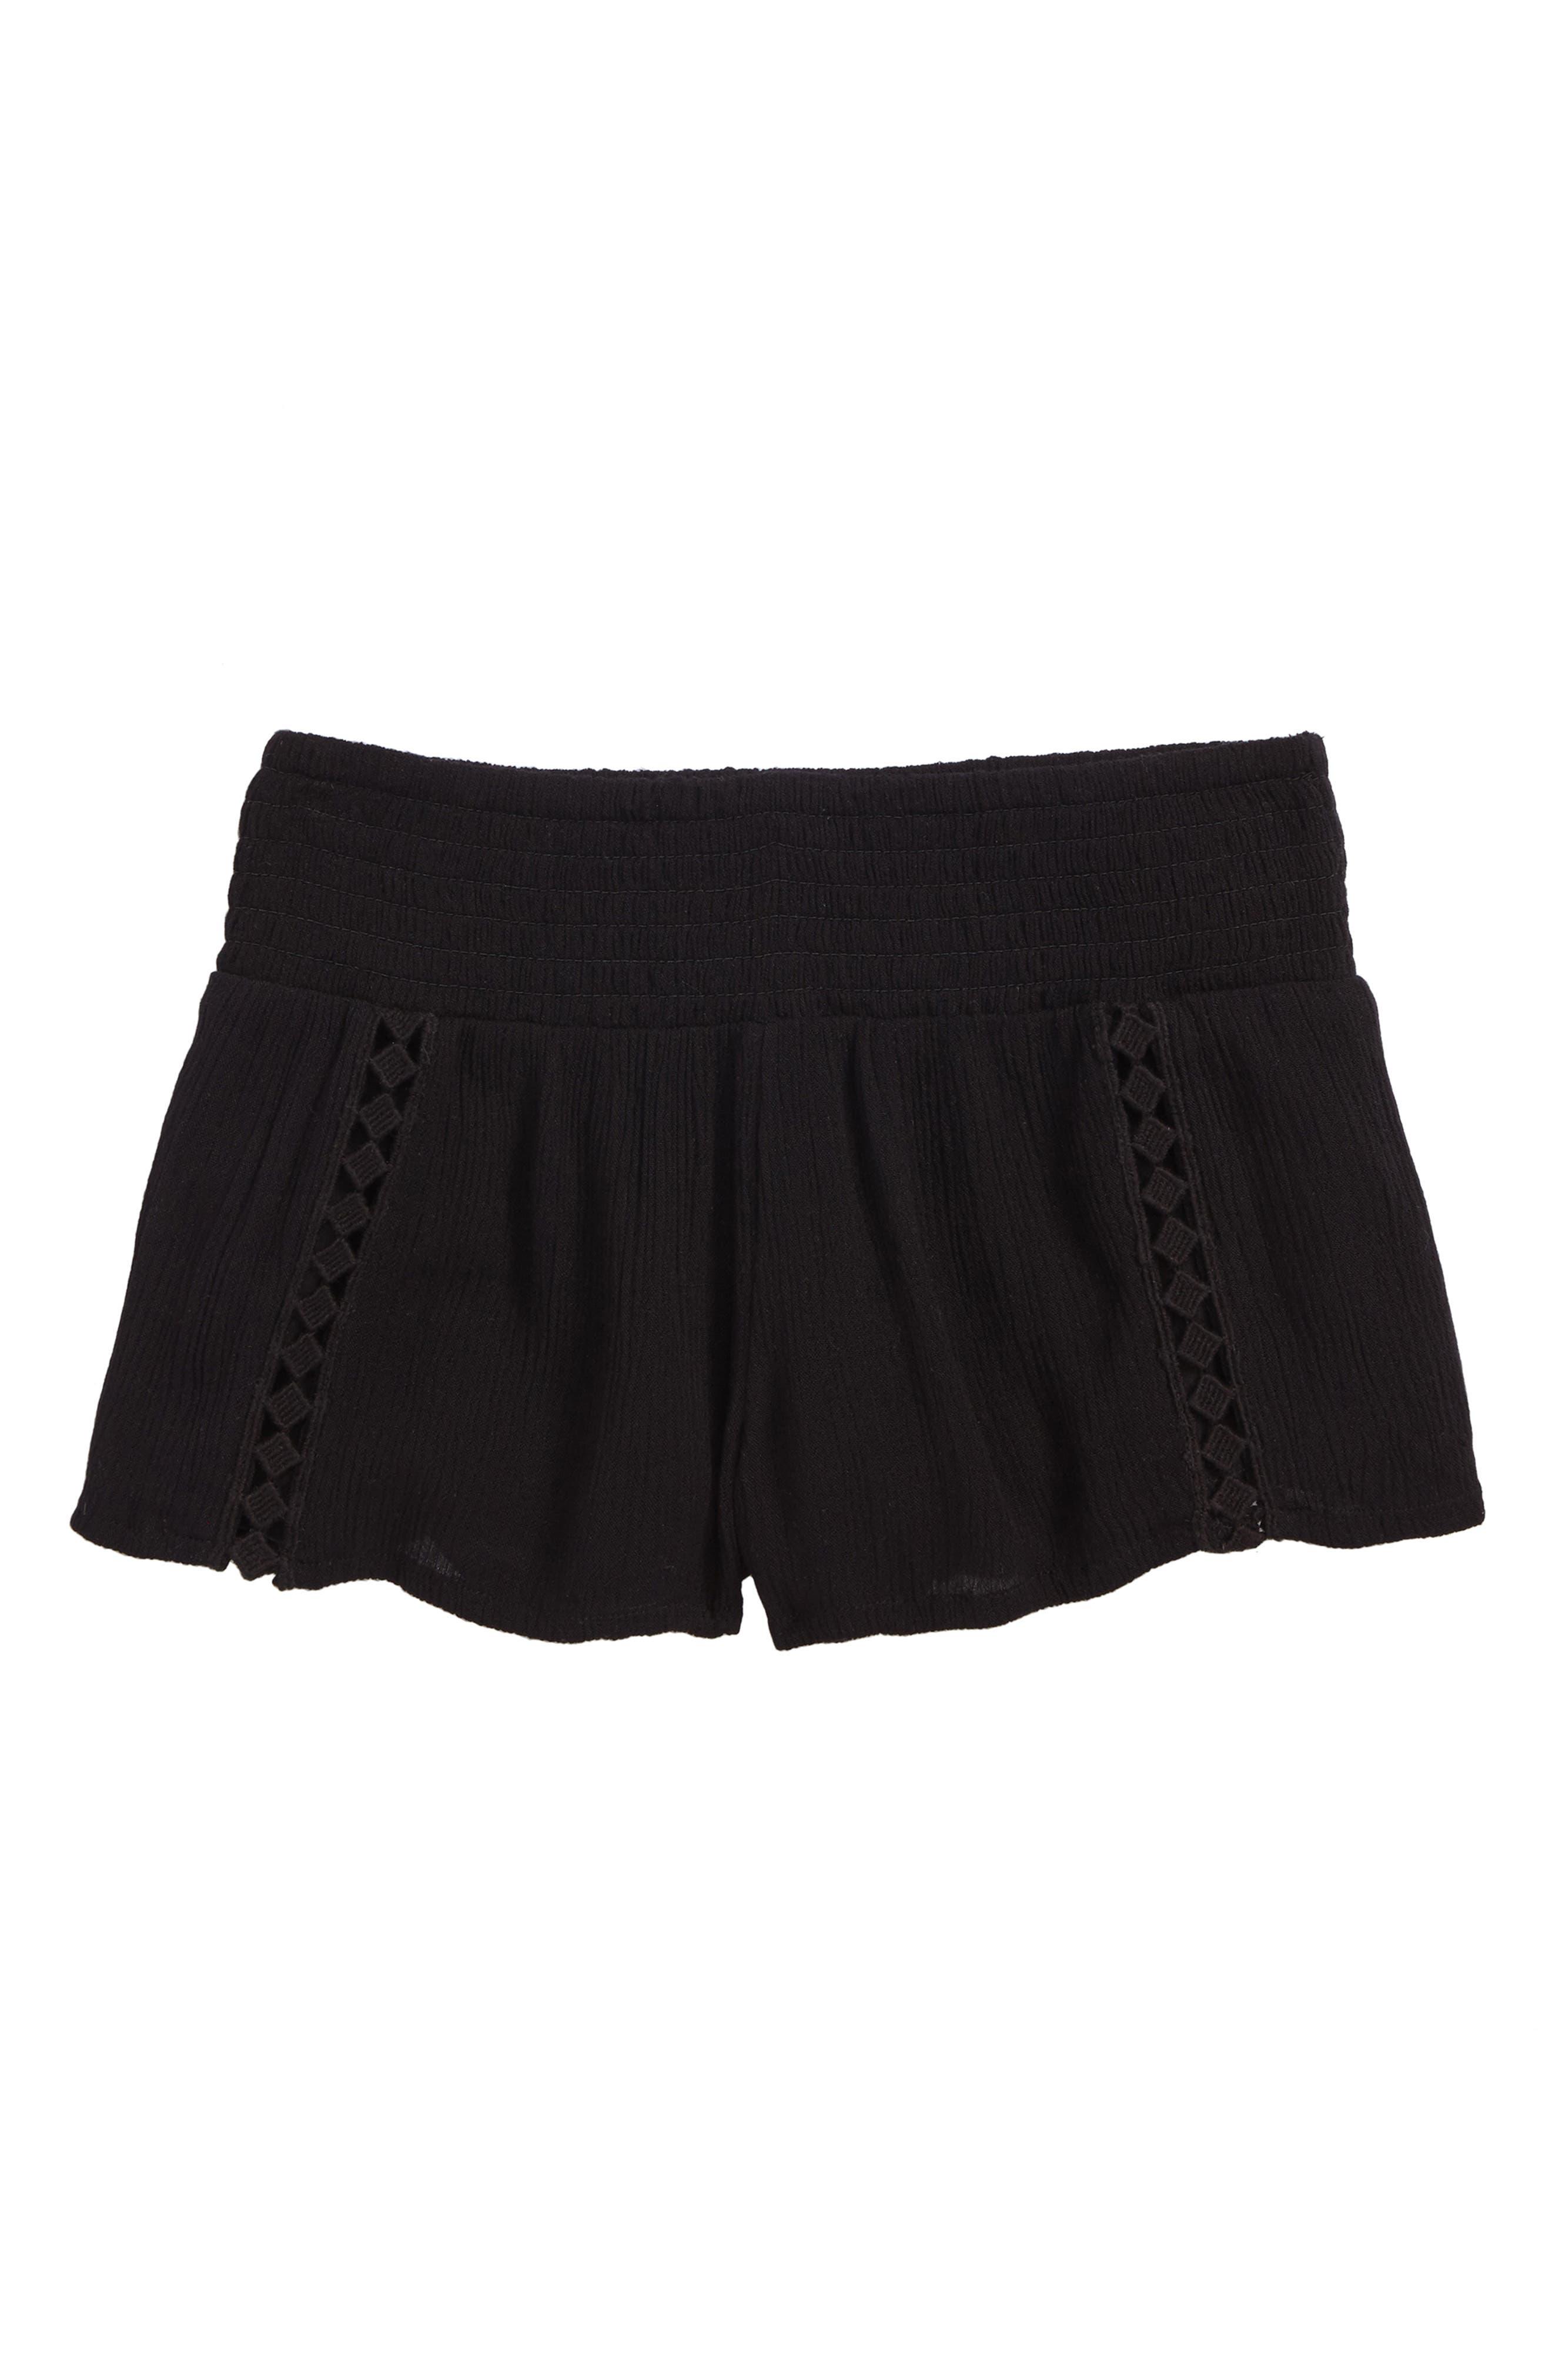 Elsa Smocked Waist Shorts,                             Main thumbnail 1, color,                             Black - Blk